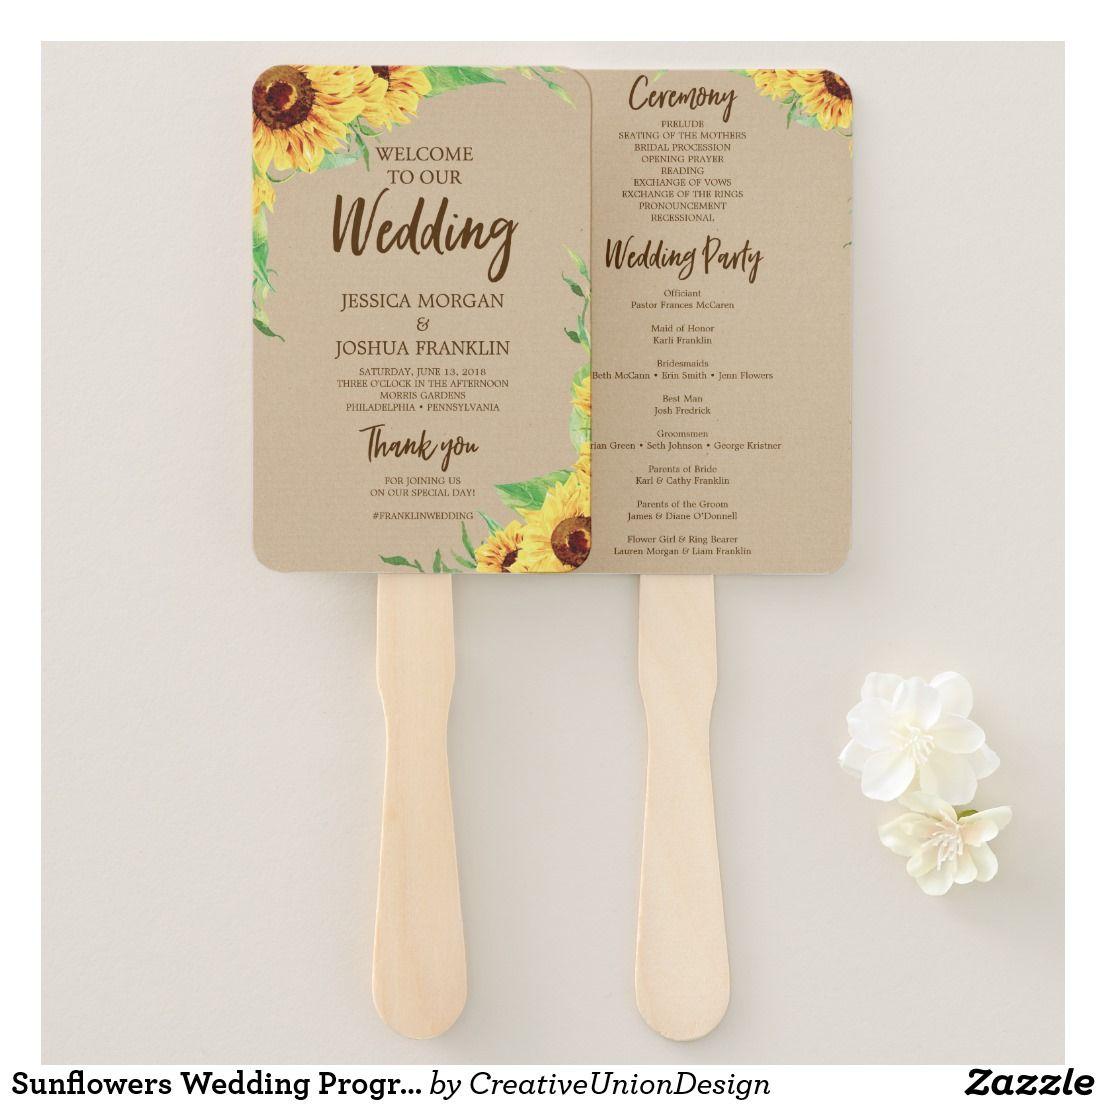 Sunflowers wedding program fan outdoor wedding ideas pinterest